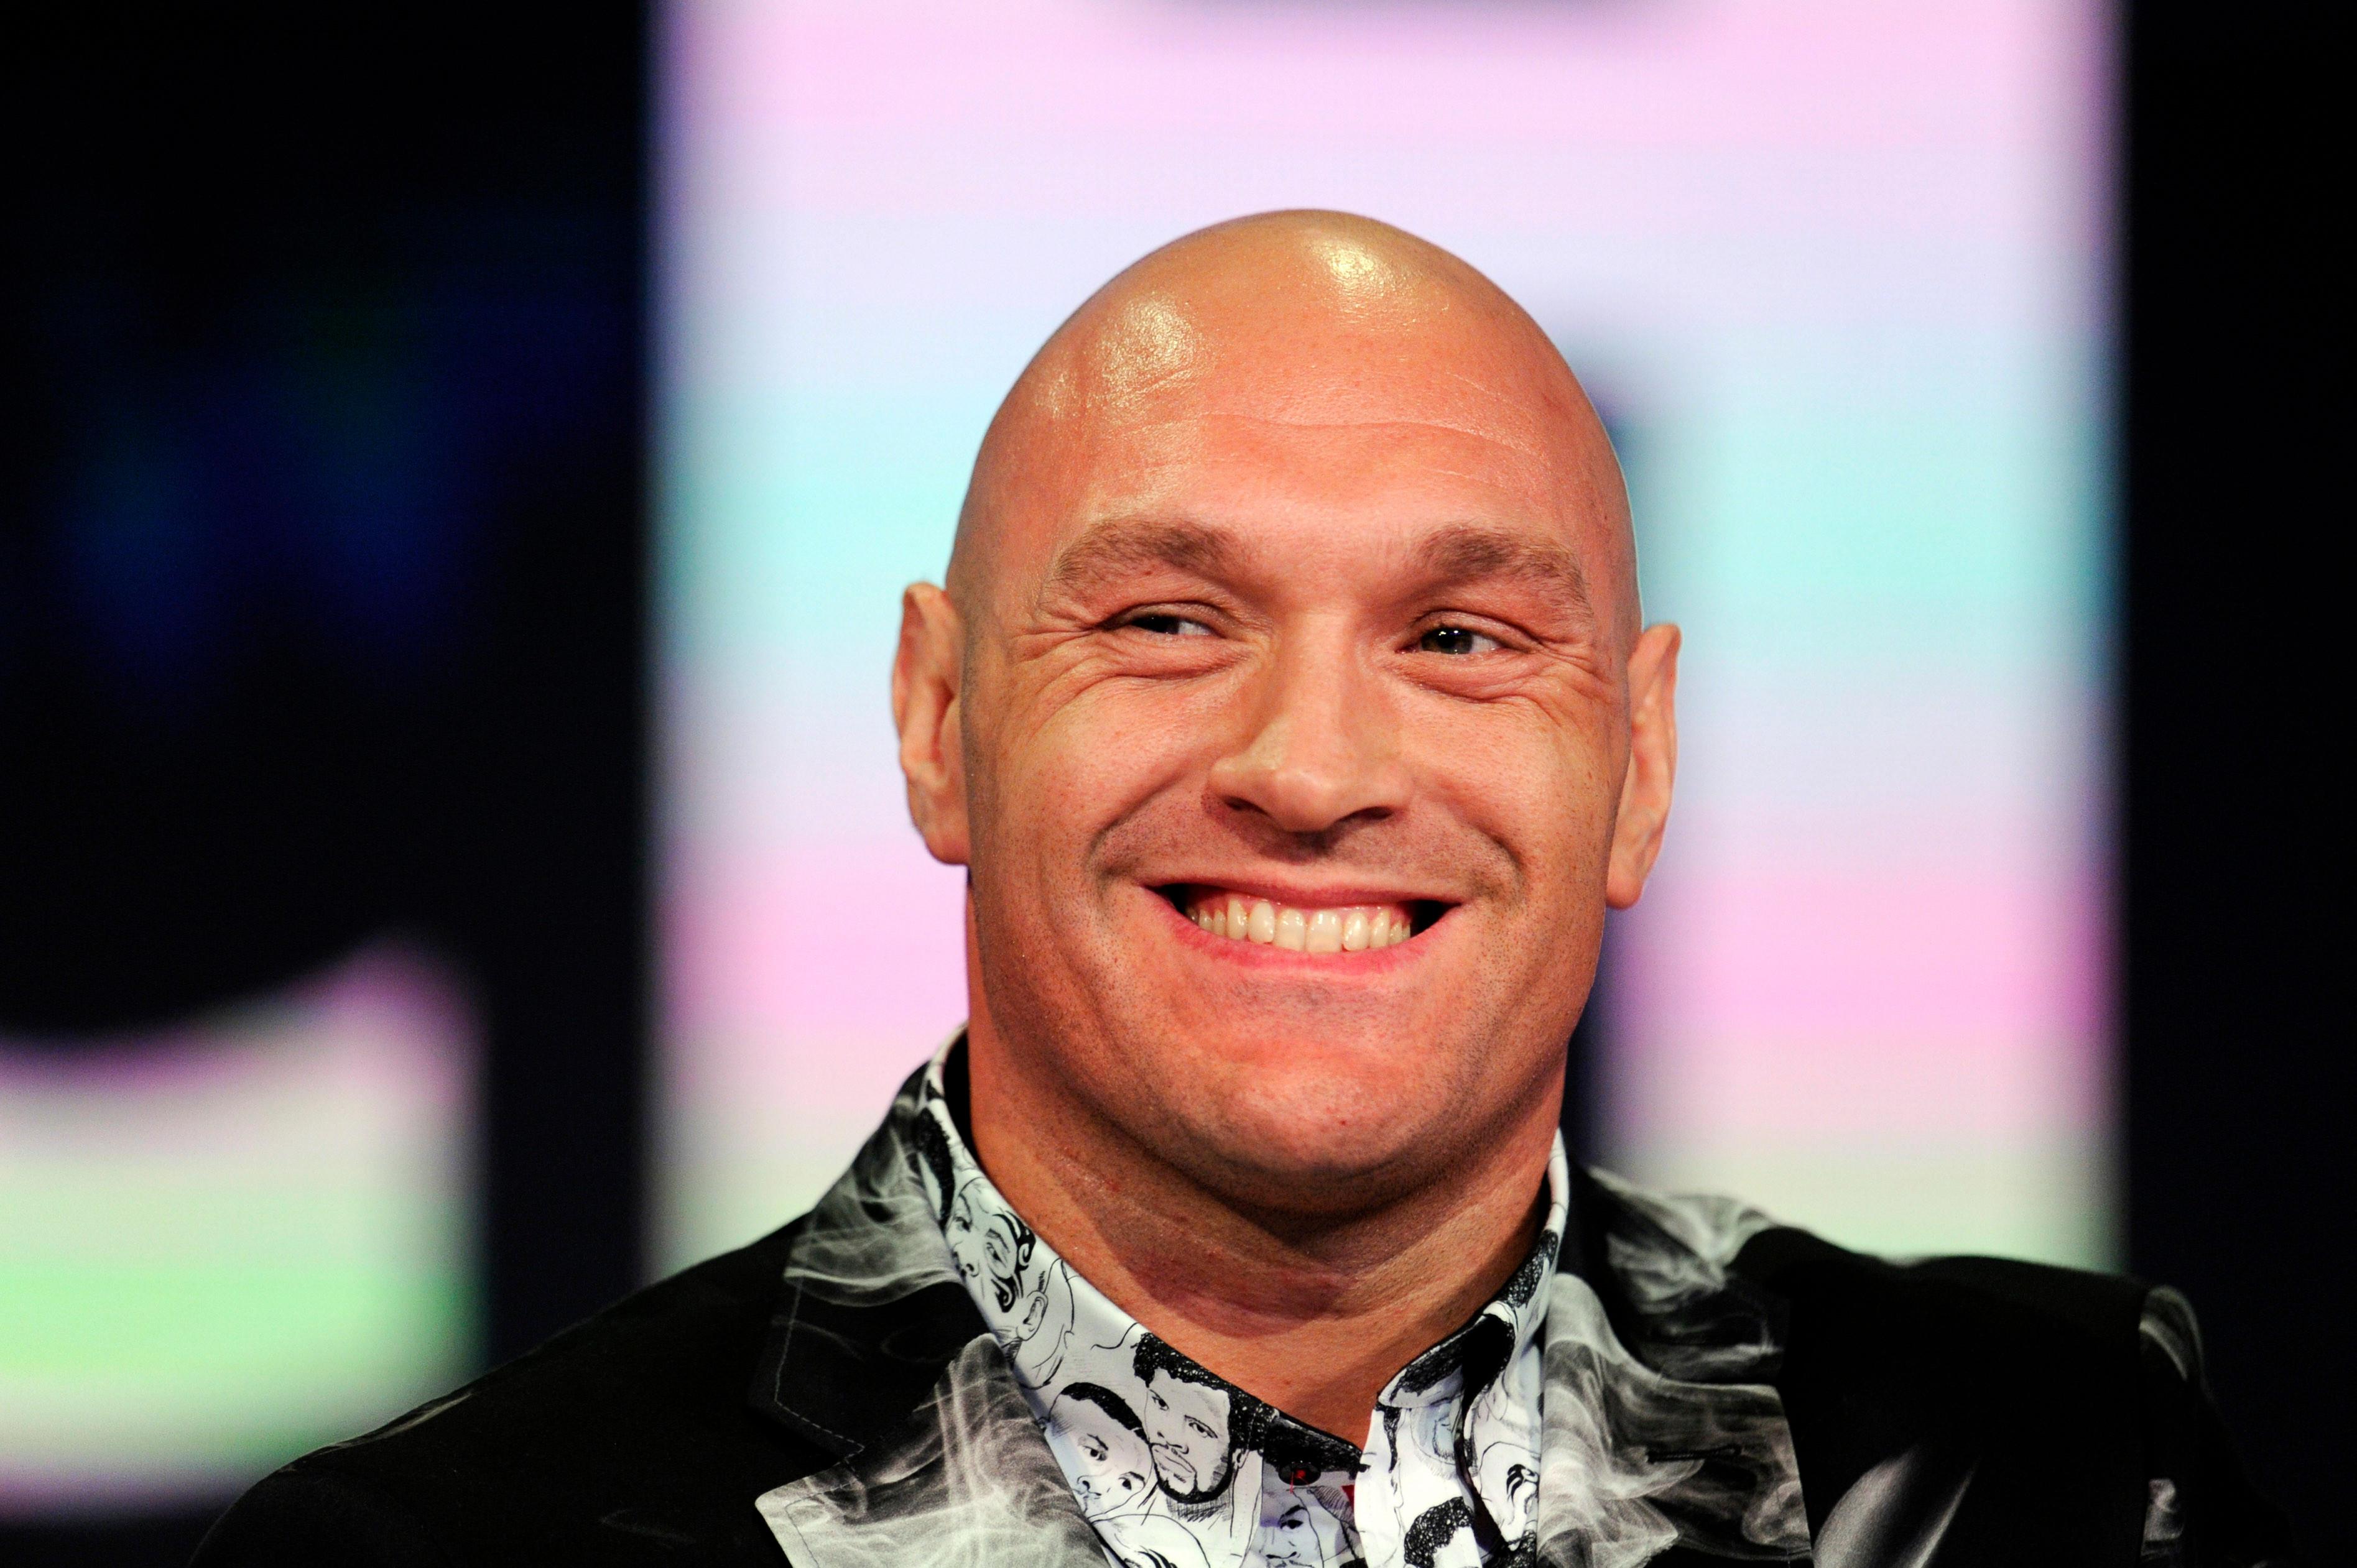 Fury faces Schwarz on June 15